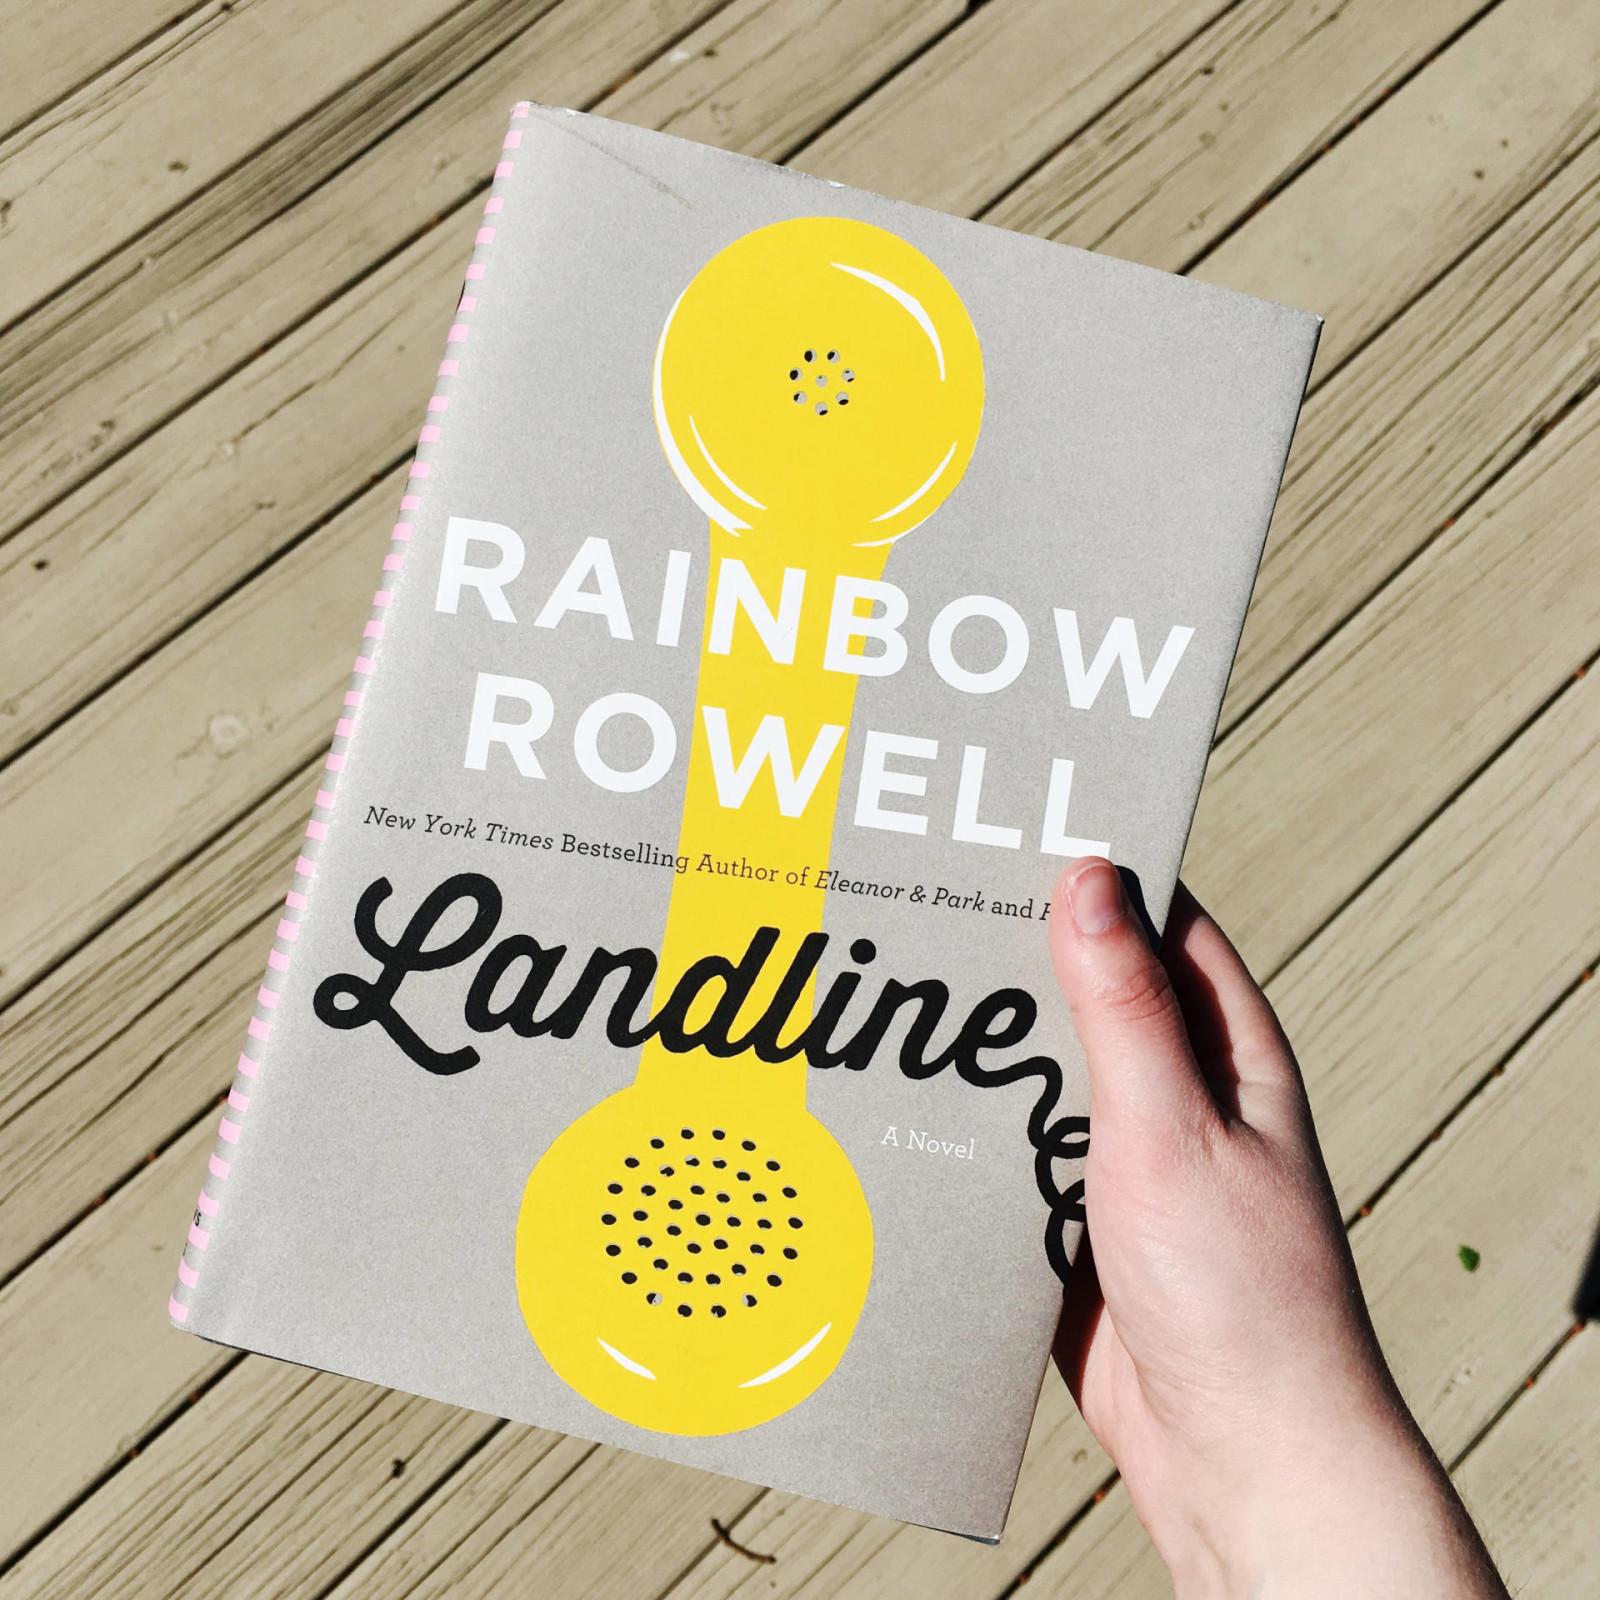 landline rainbow rowell book cover